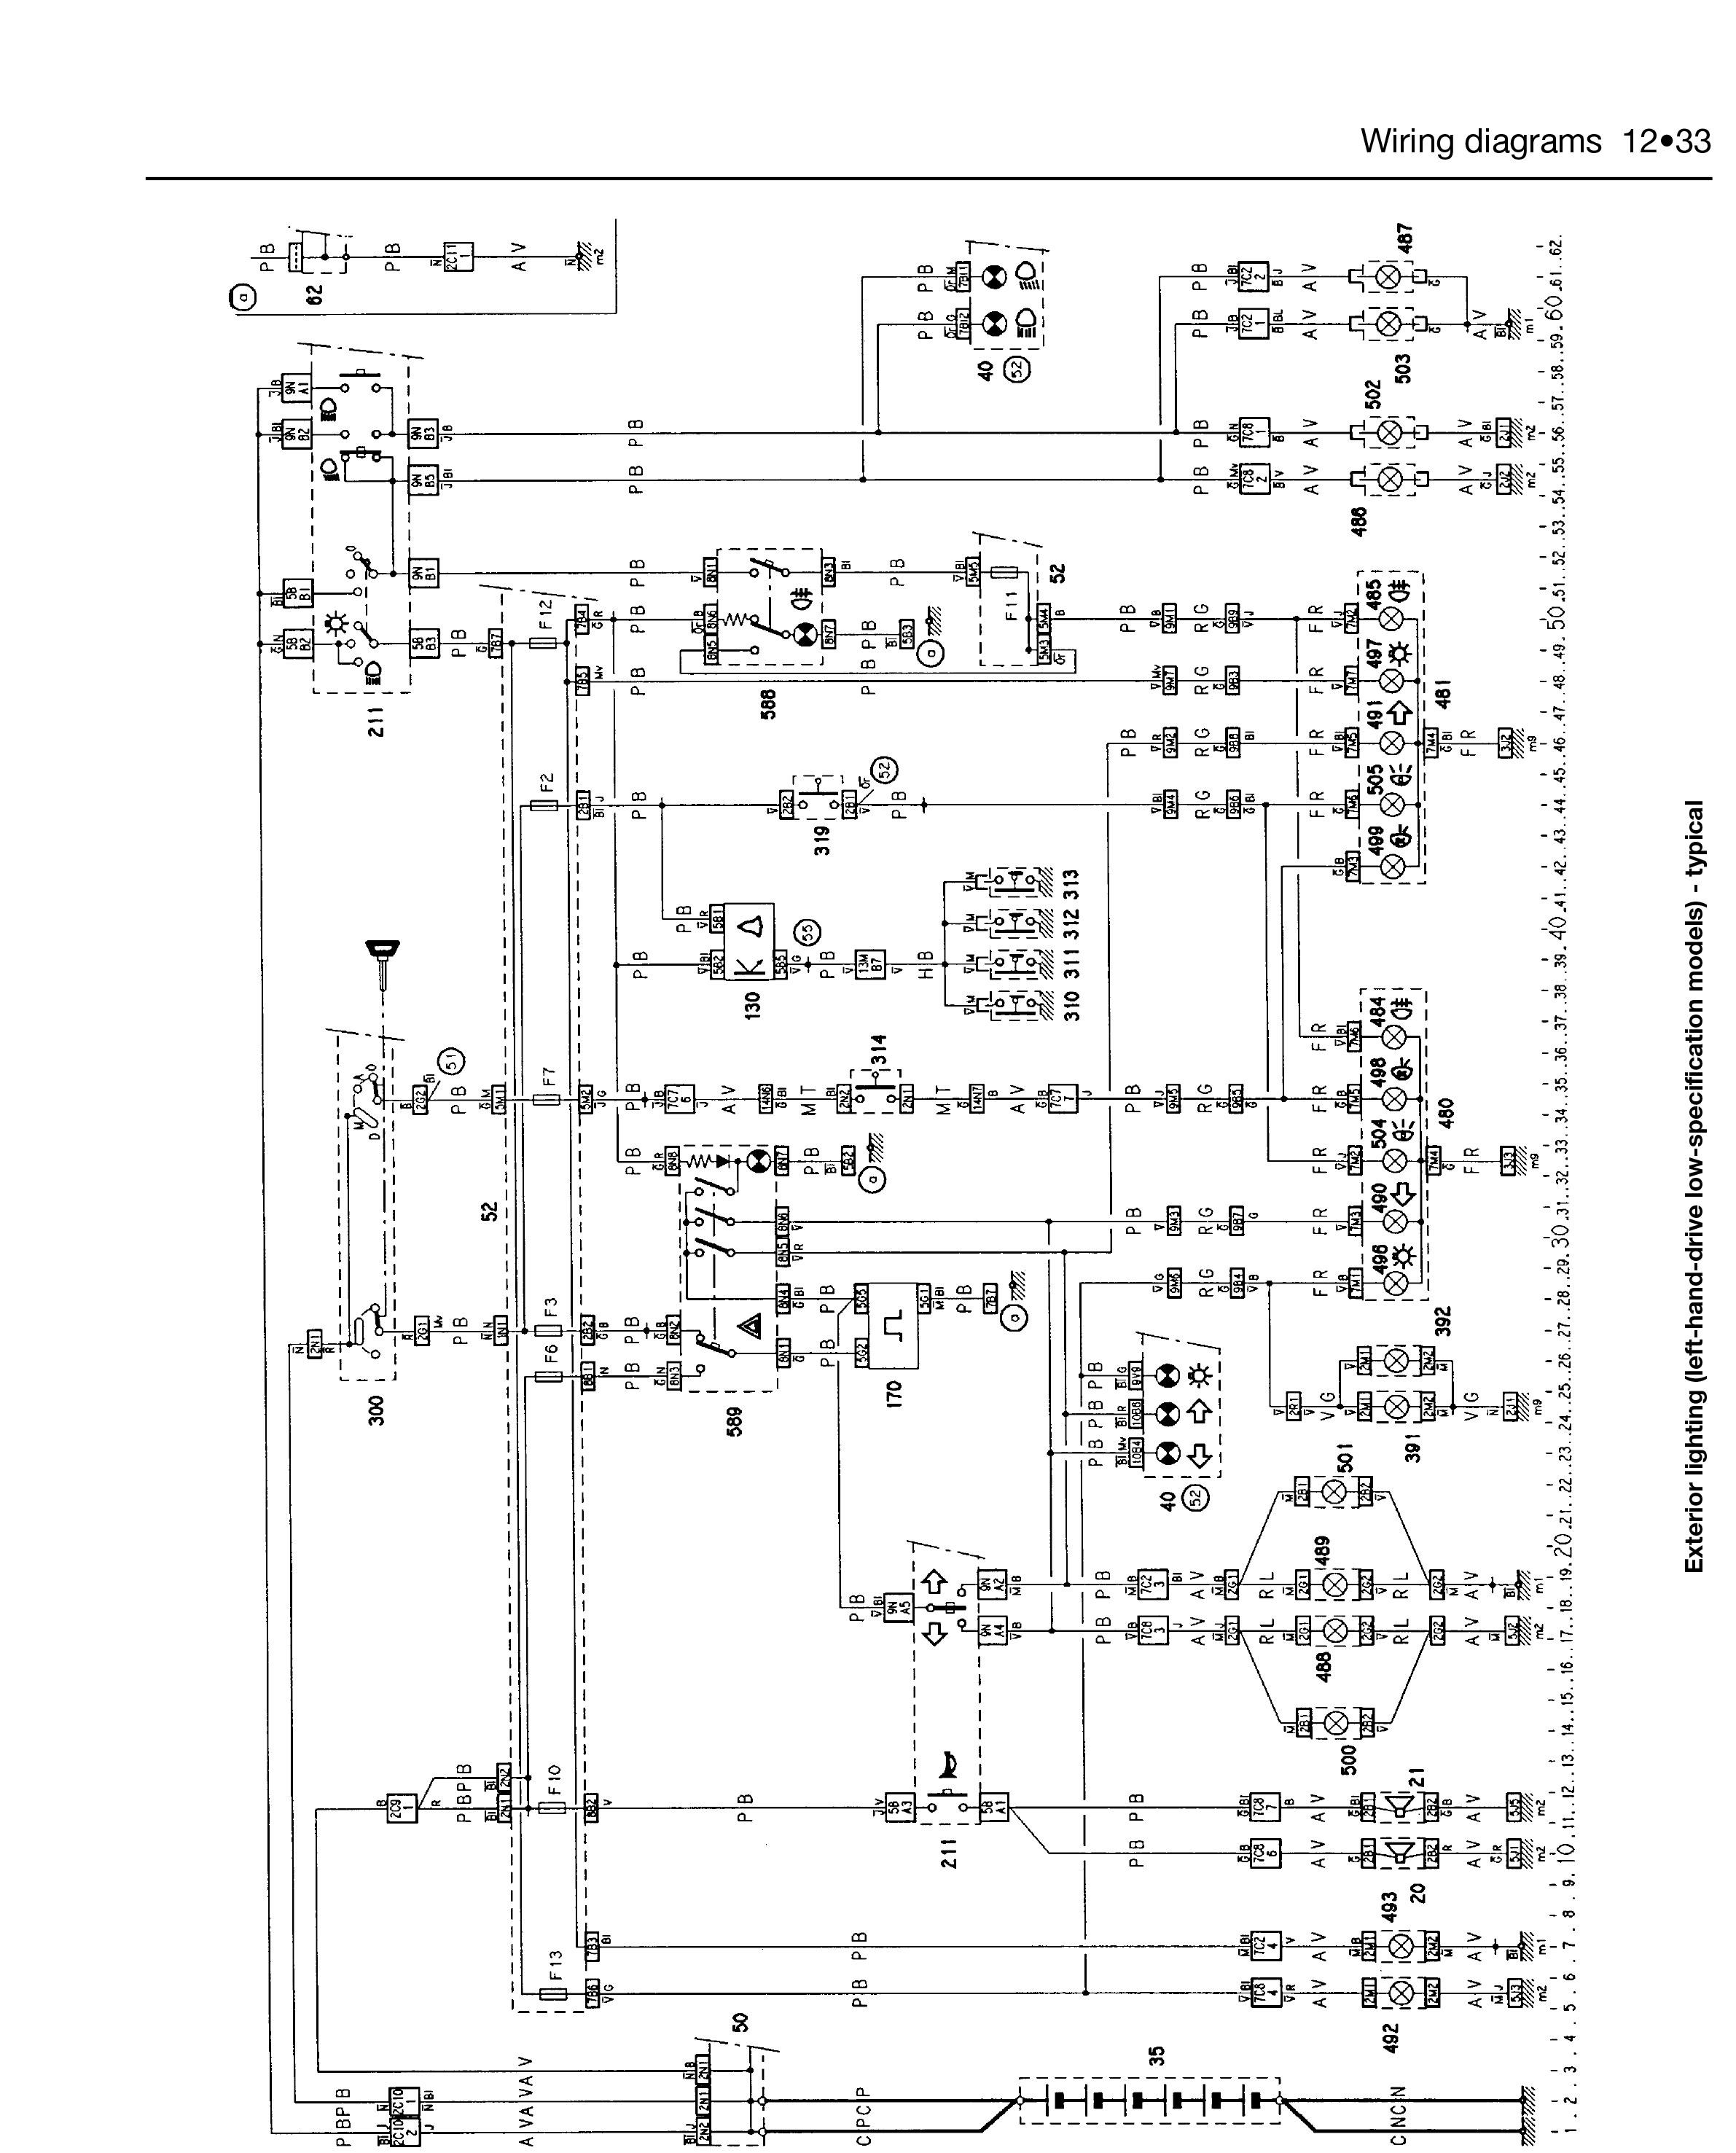 Ow 1454  Citroen Zx Wiring Diagram Download Diagram